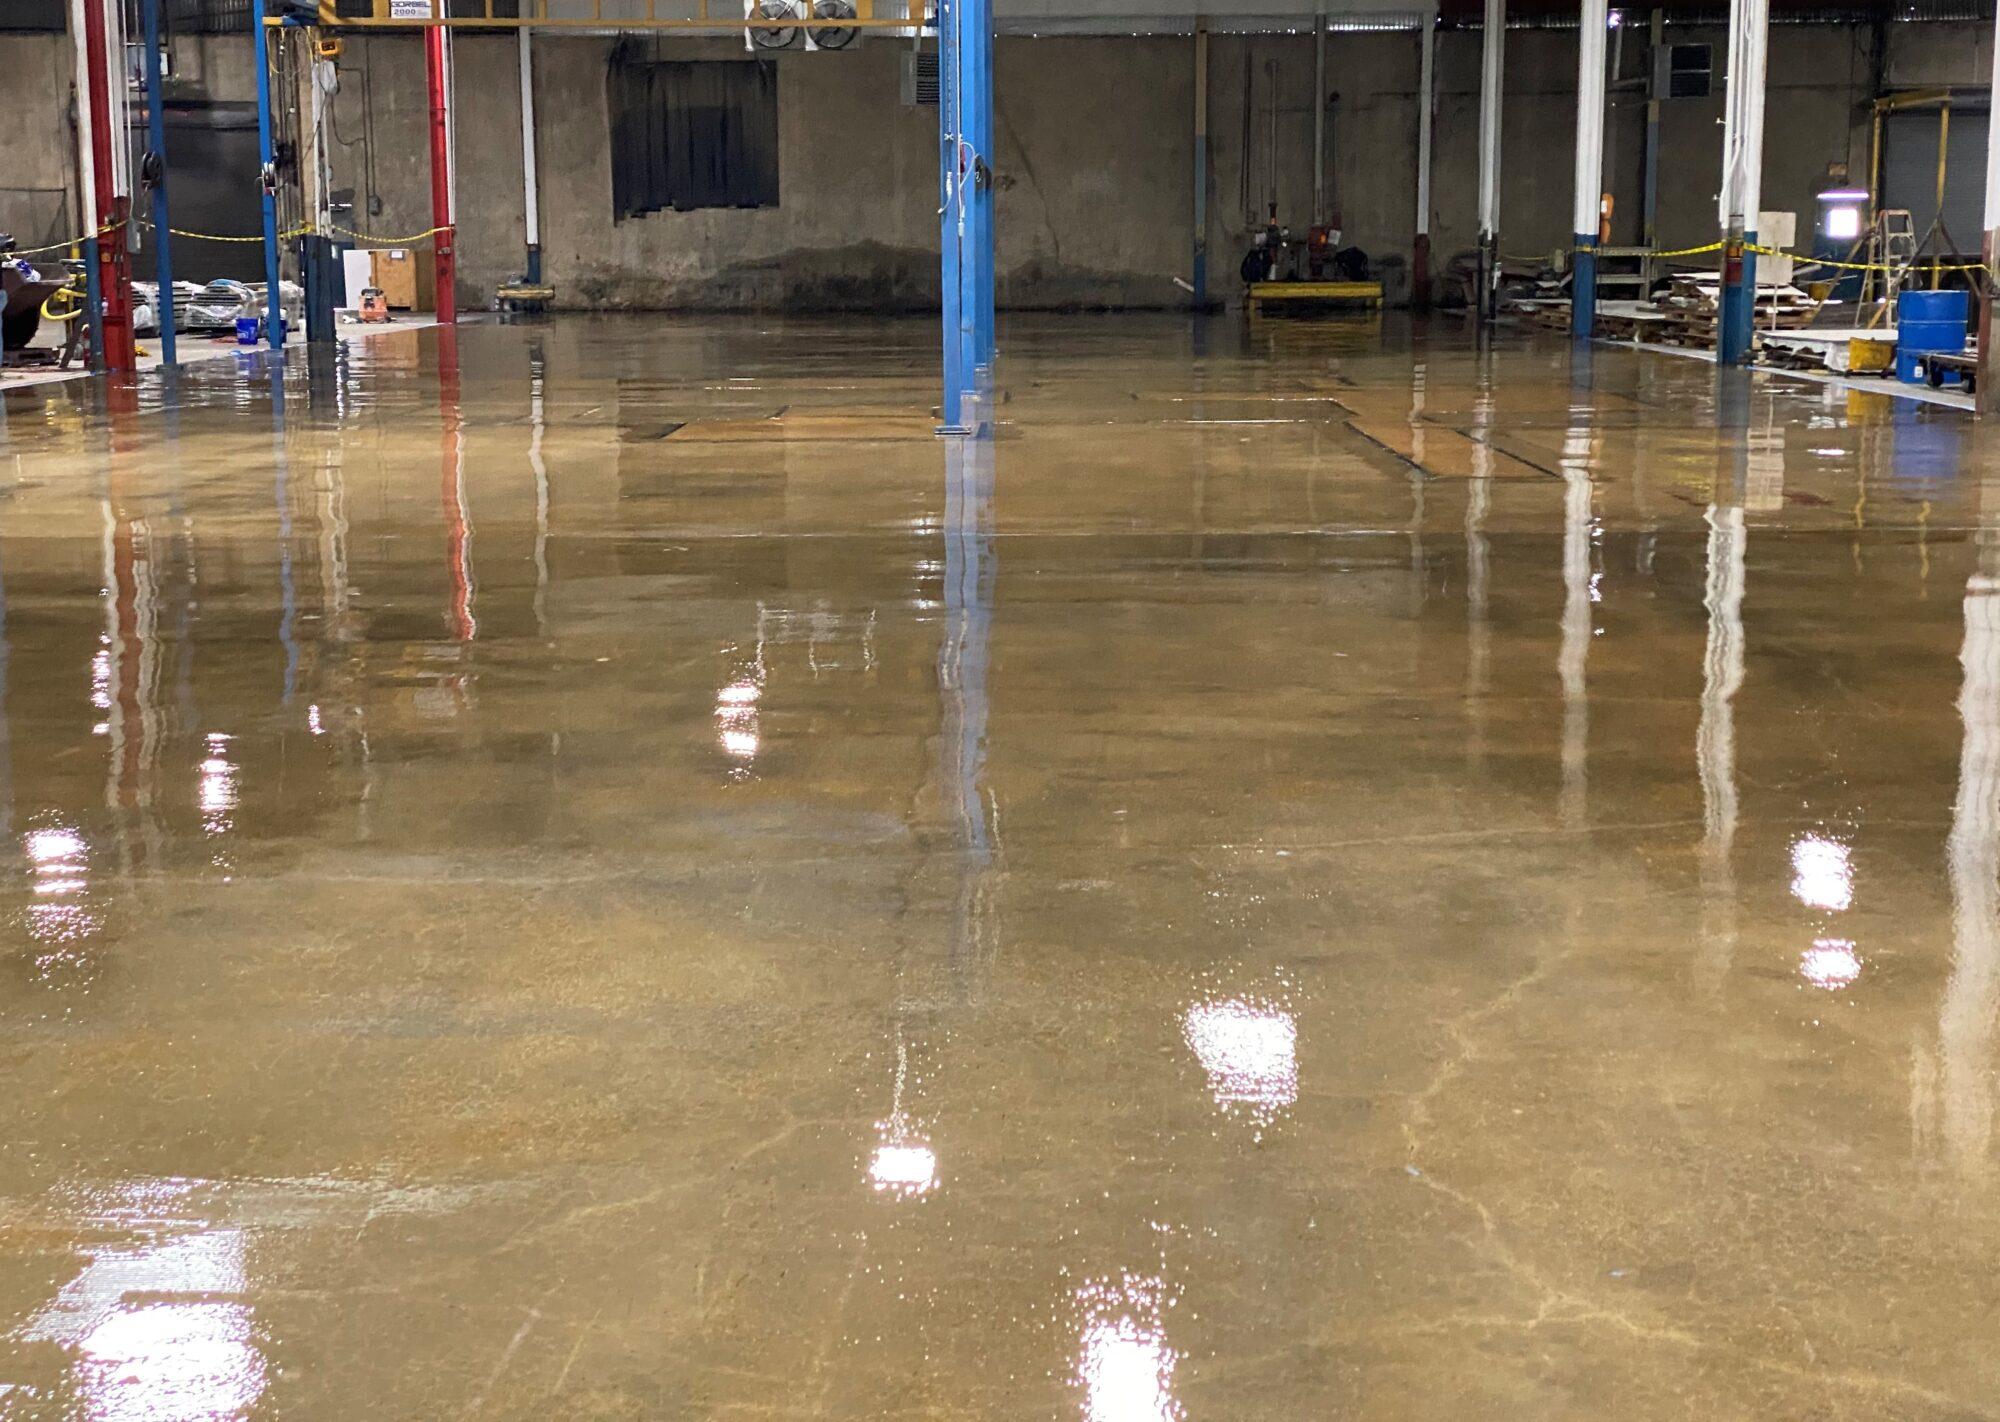 Epoxy flooring, epoxy floor coating, epoxy floor coating GrenadaTN, TeamIA, Industrial Applications Inc., IA32yrs, GrenadaTN